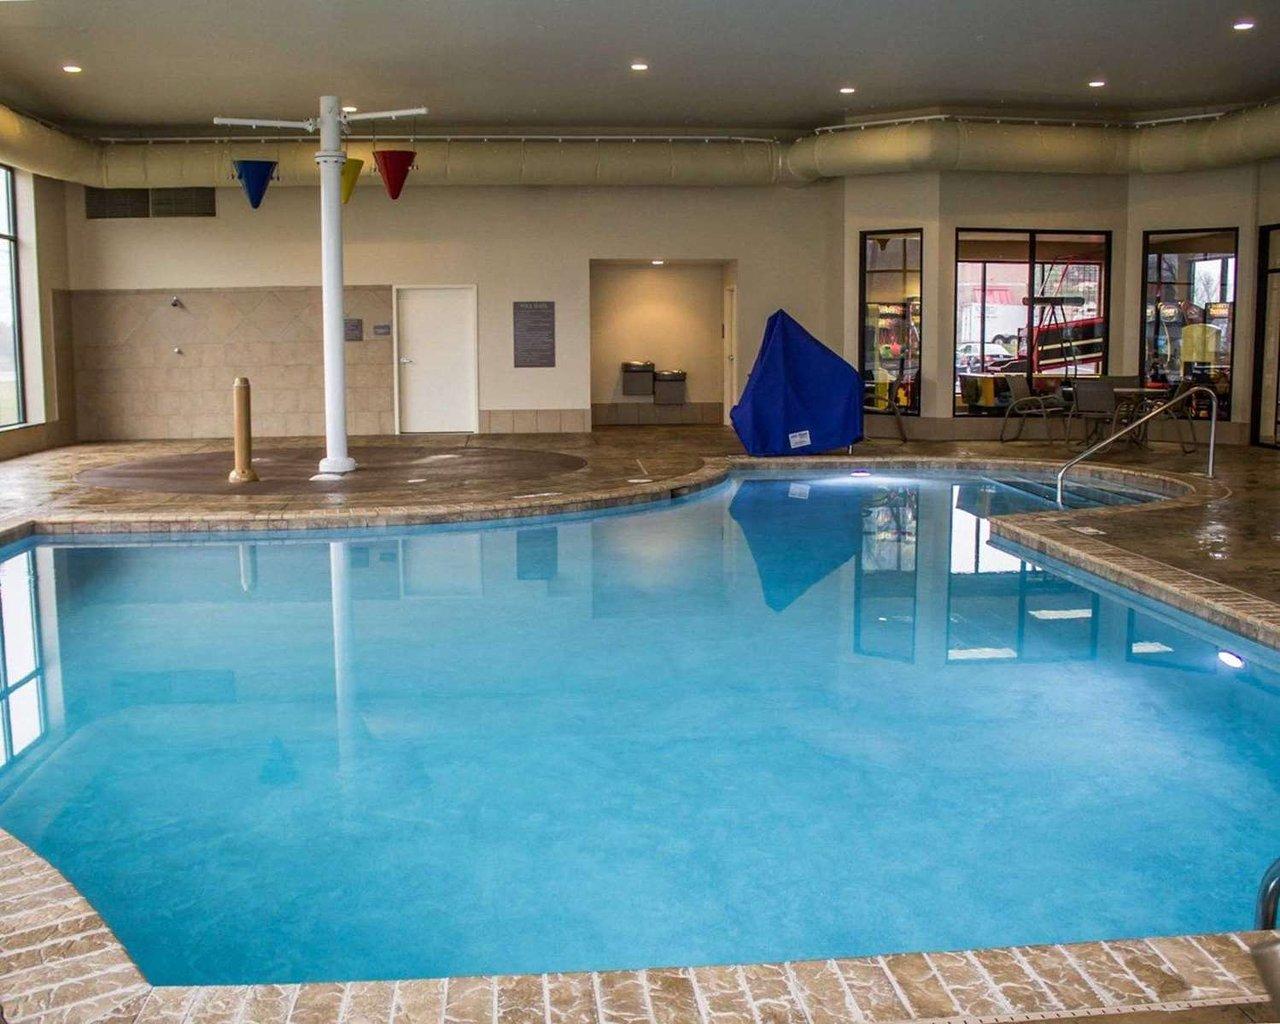 Comfort Inn Suites 76 1 0 6 Updated 2019 Prices Hotel Reviews Wadsworth Ohio Tripadvisor